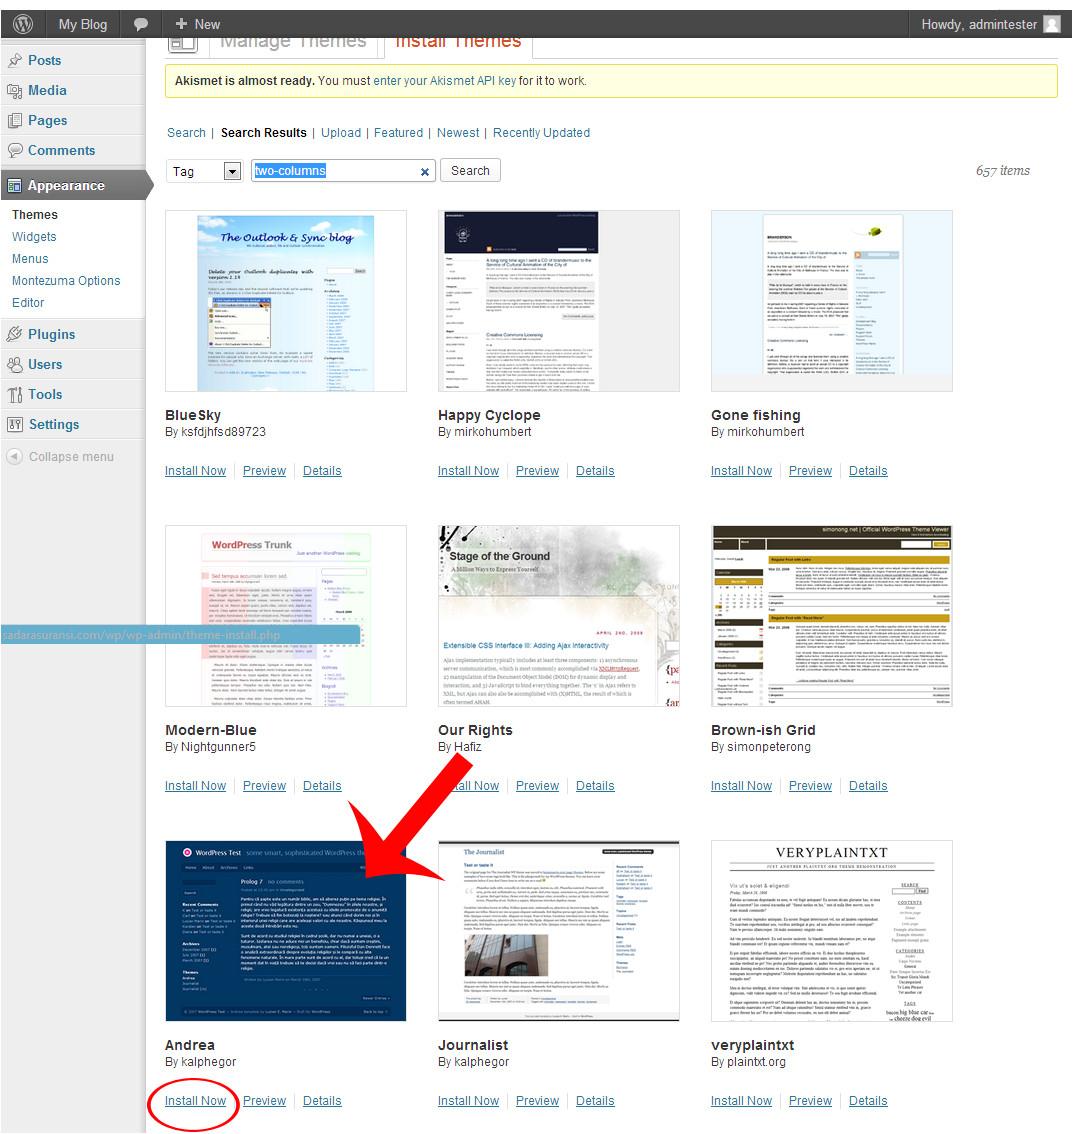 Cara Install Template WordPress Belajar Membuat Website Untuk Pemula Step 1a Install